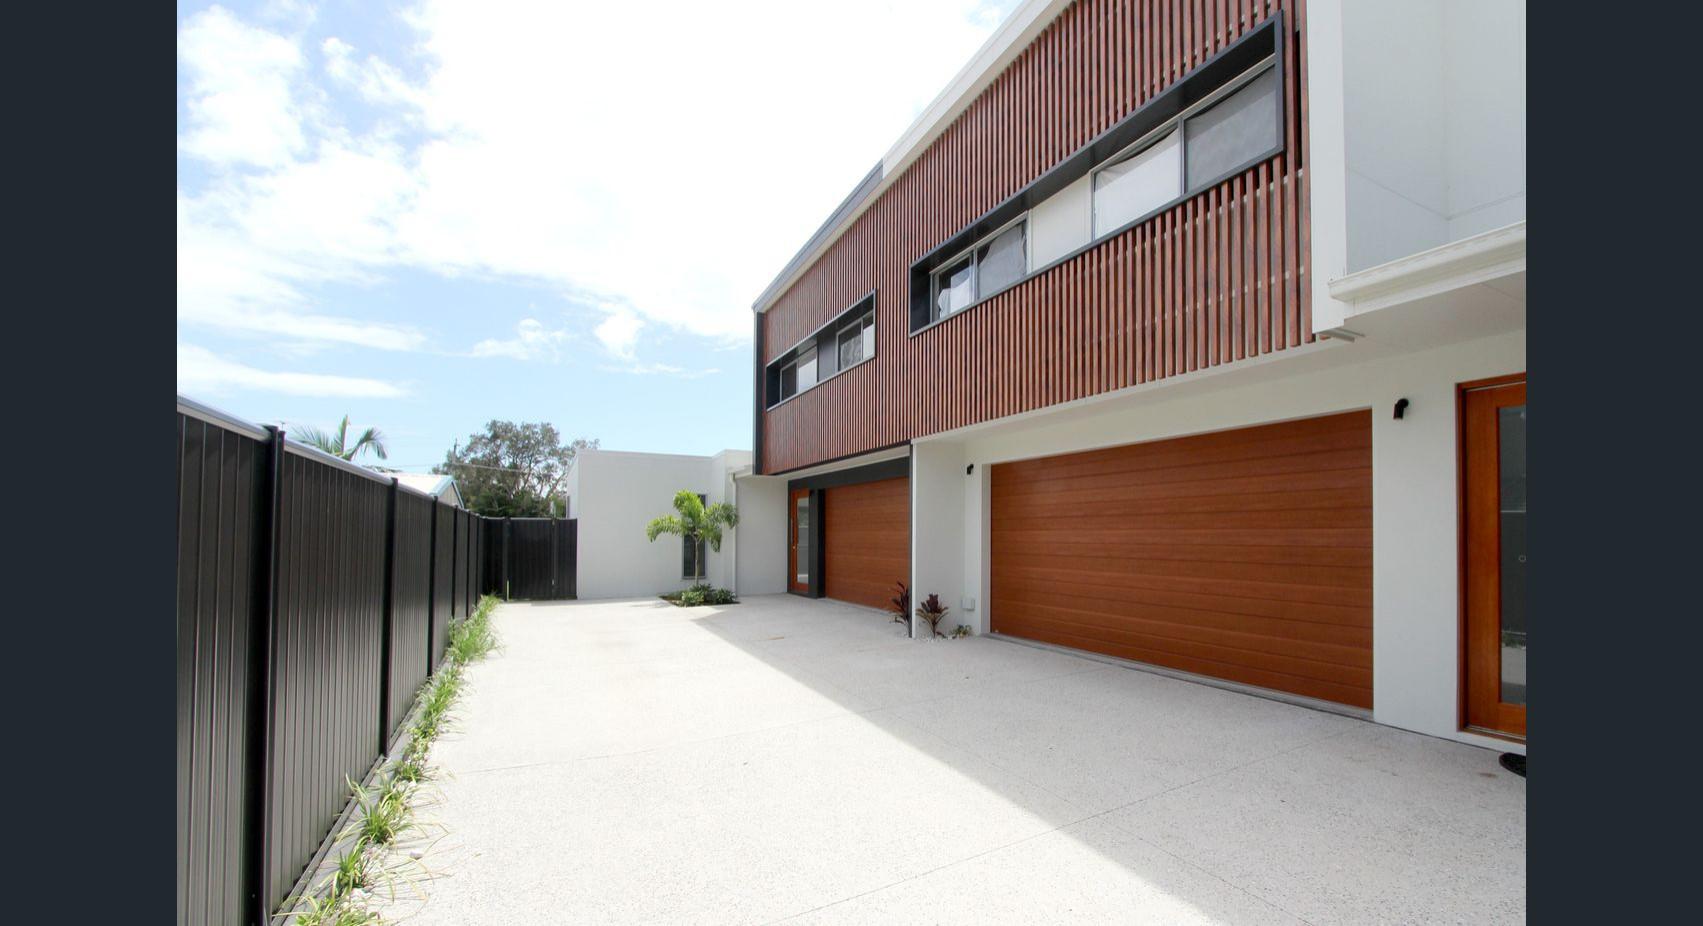 Dalby Street Duplex